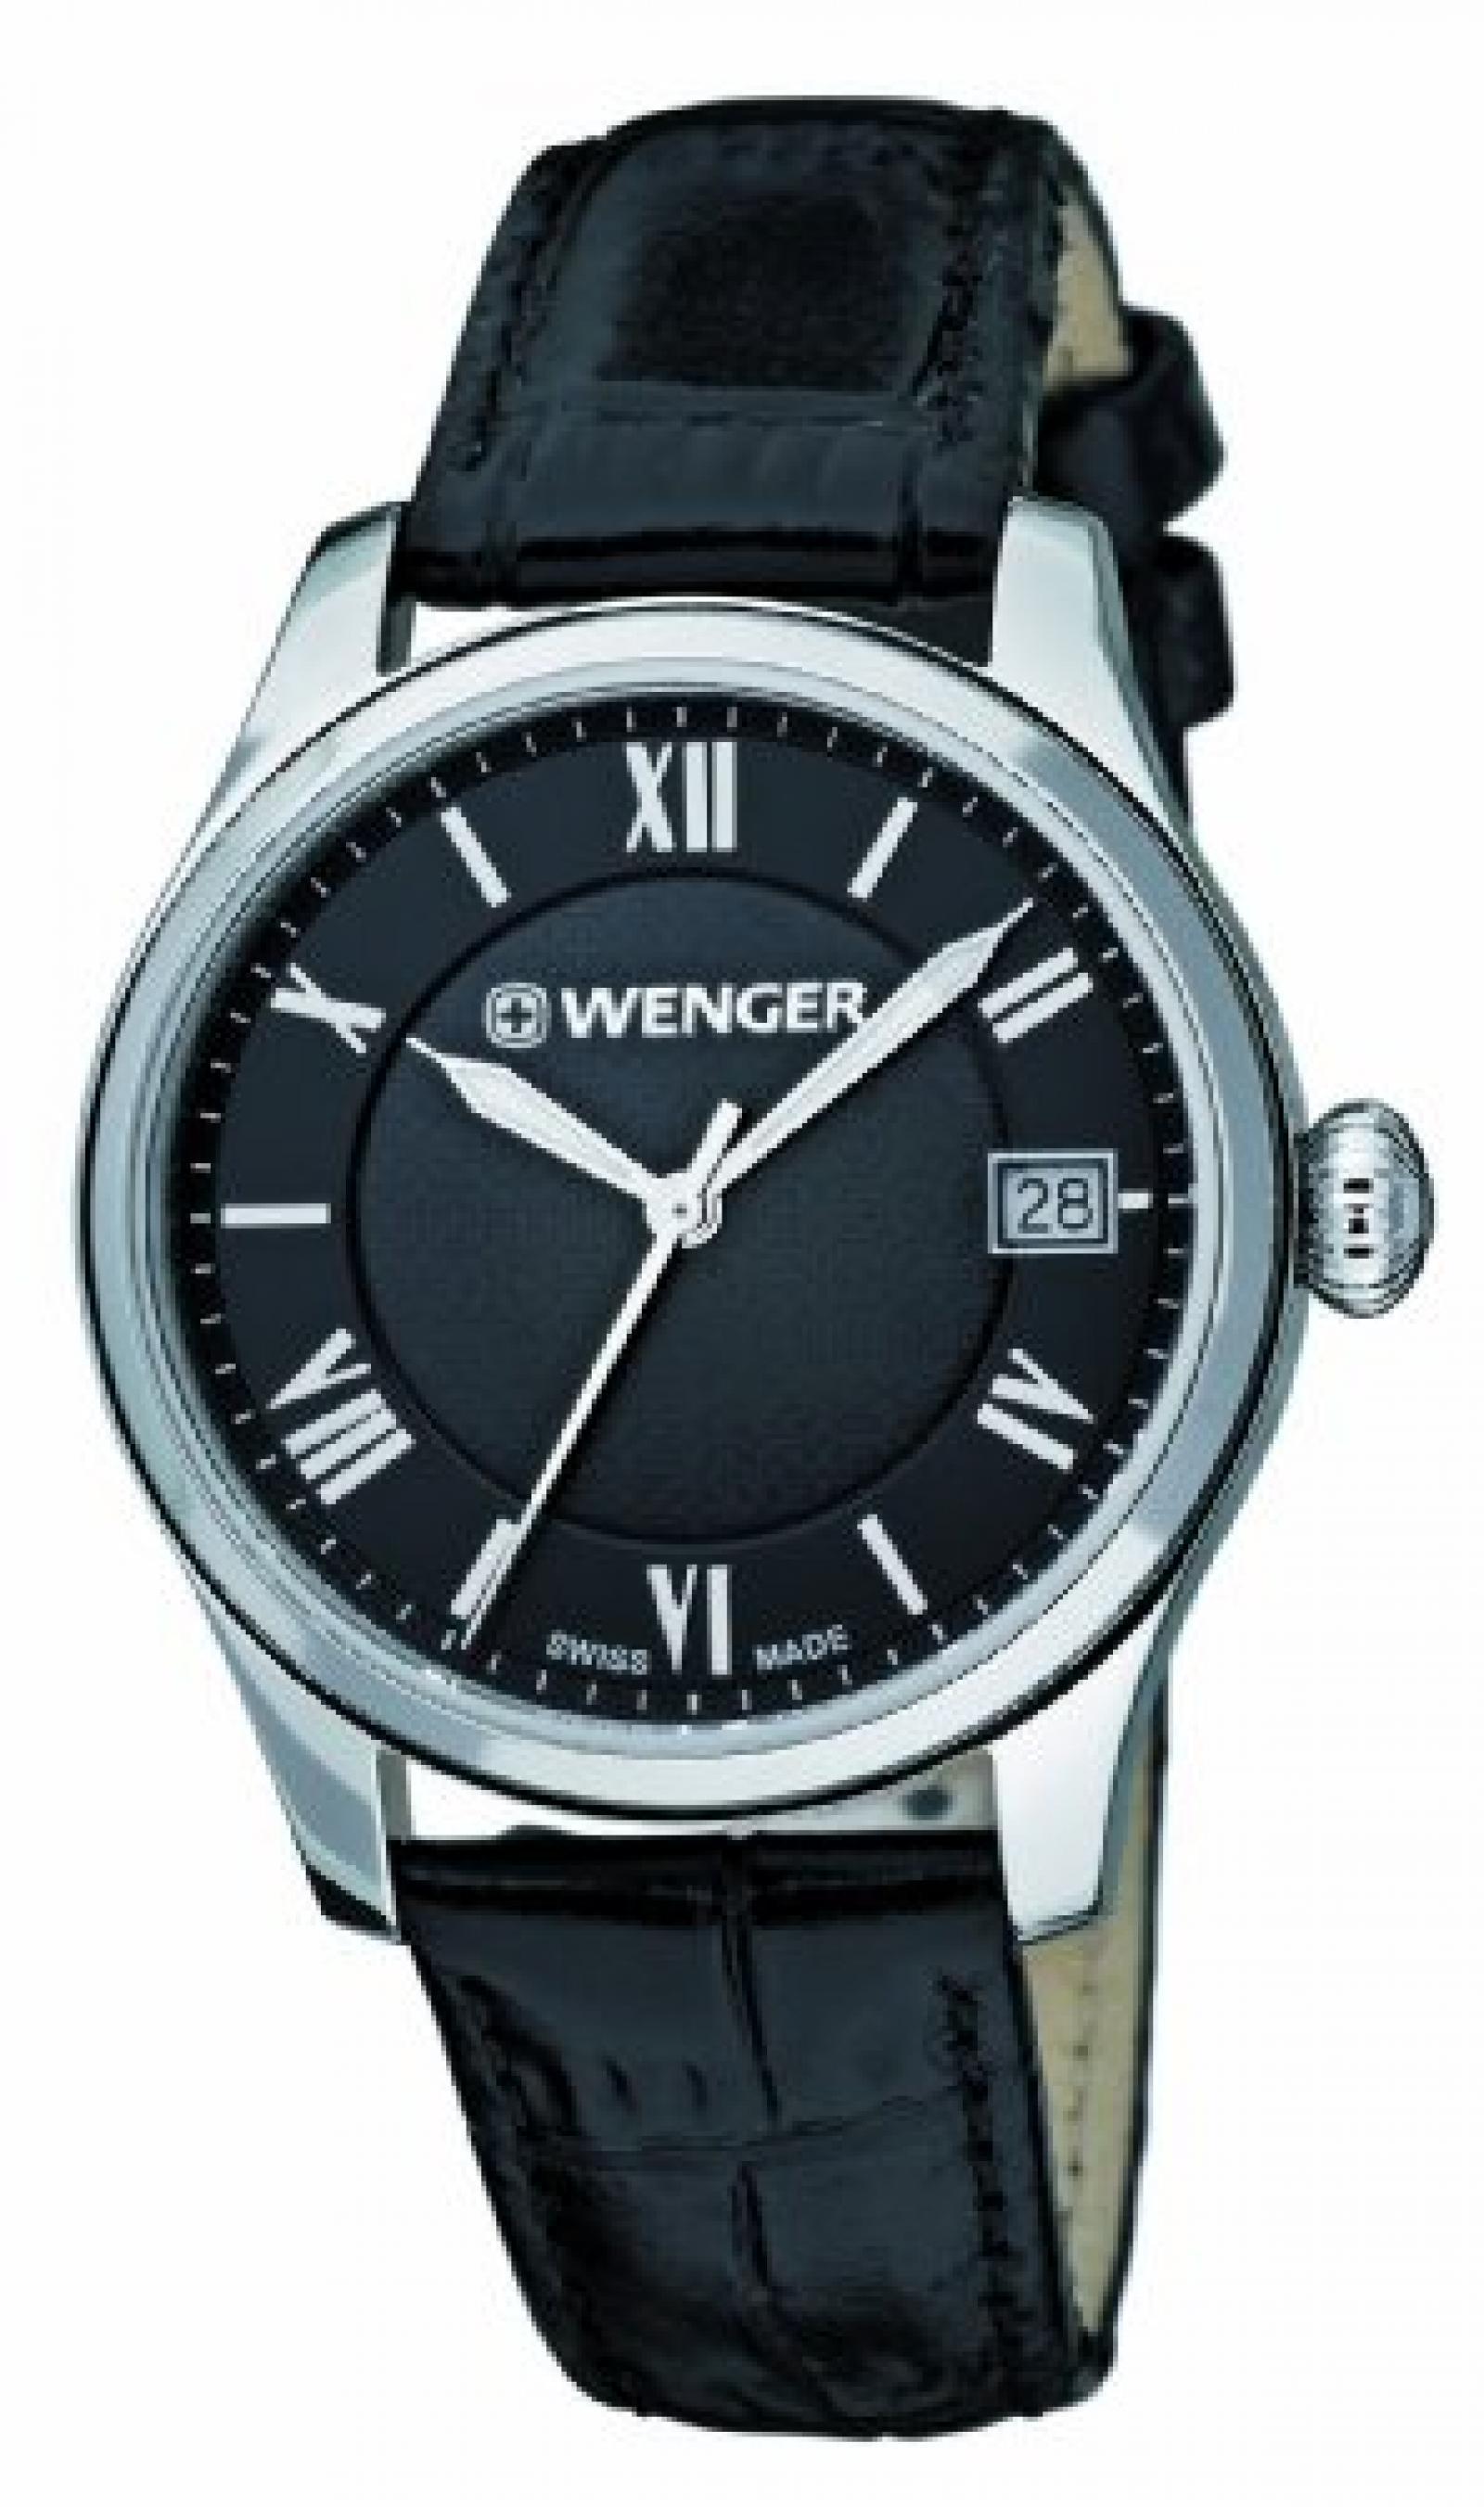 Wenger Damen-Armbanduhr XS Terragraph Analog Quarz Leder 01.0521.104